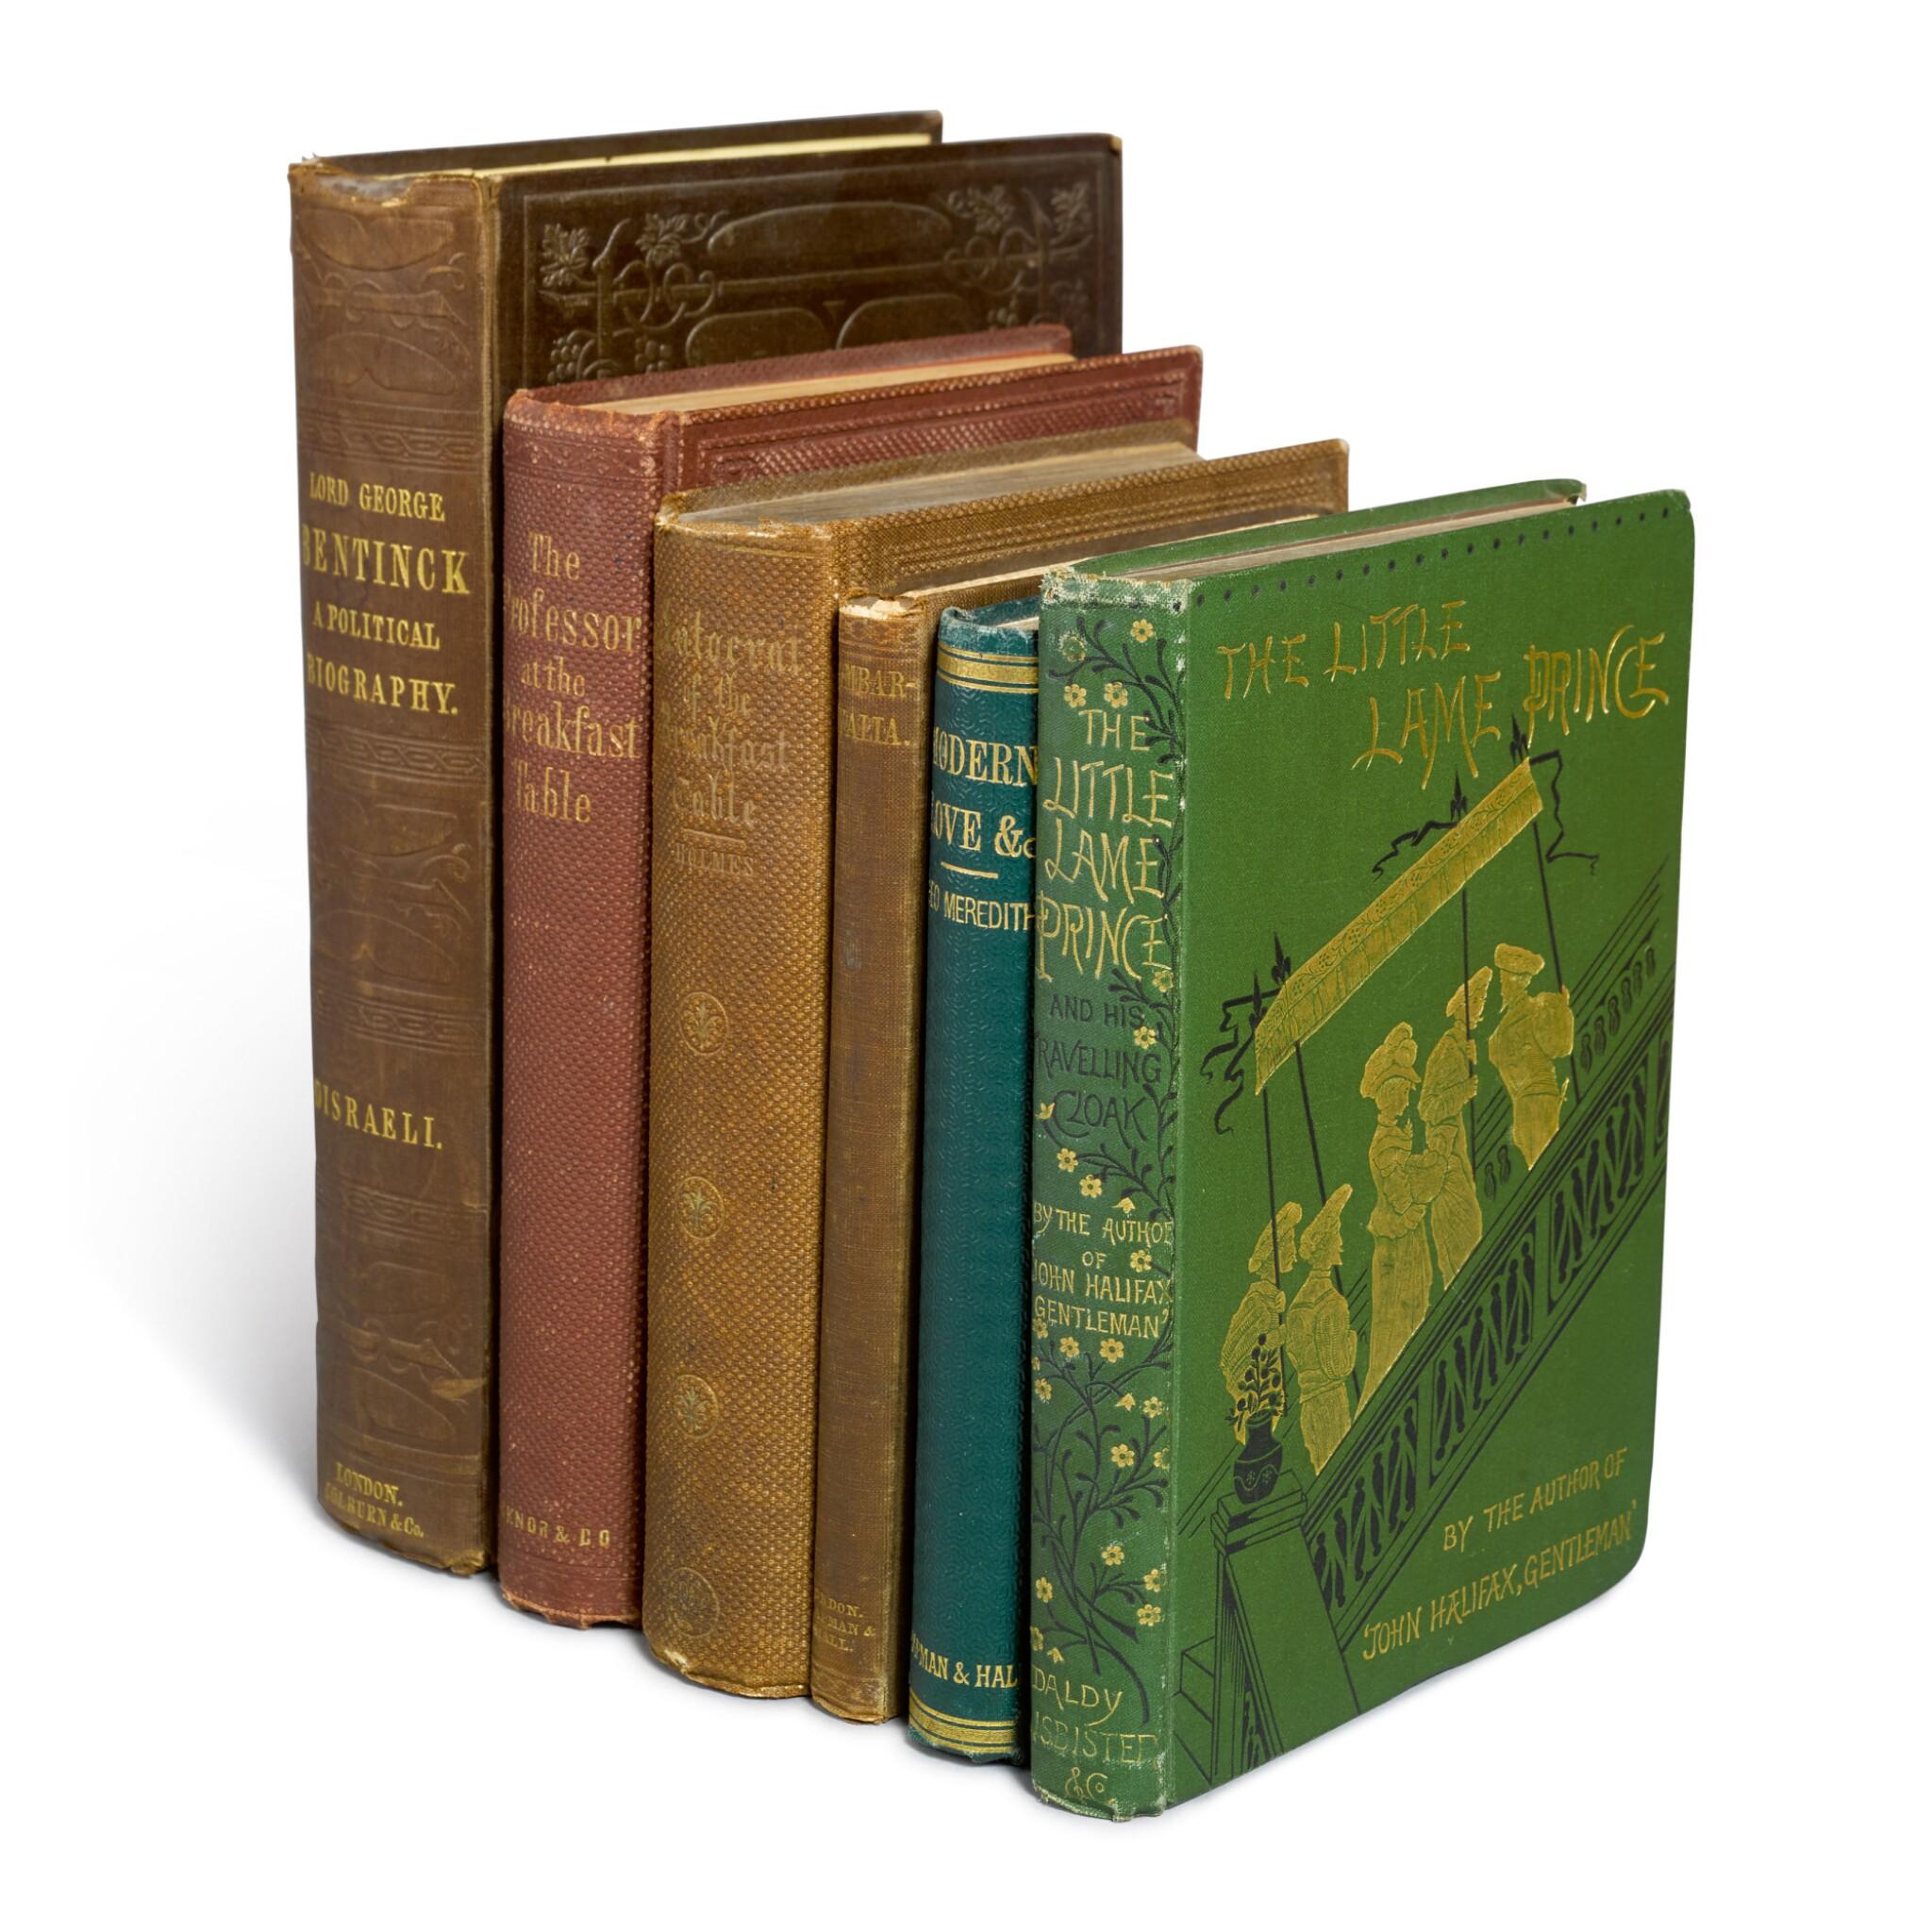 CLOUGH, ARTHUR HUGH, AND THOMAS BURBIDGE; DINAH MARIA MULOCK CRAIK; BENJAMIN DISRAELI; OLIVER WENDELL HOLMES; AND GEORGE MEREDITH | A Group of 19th Century First Editions